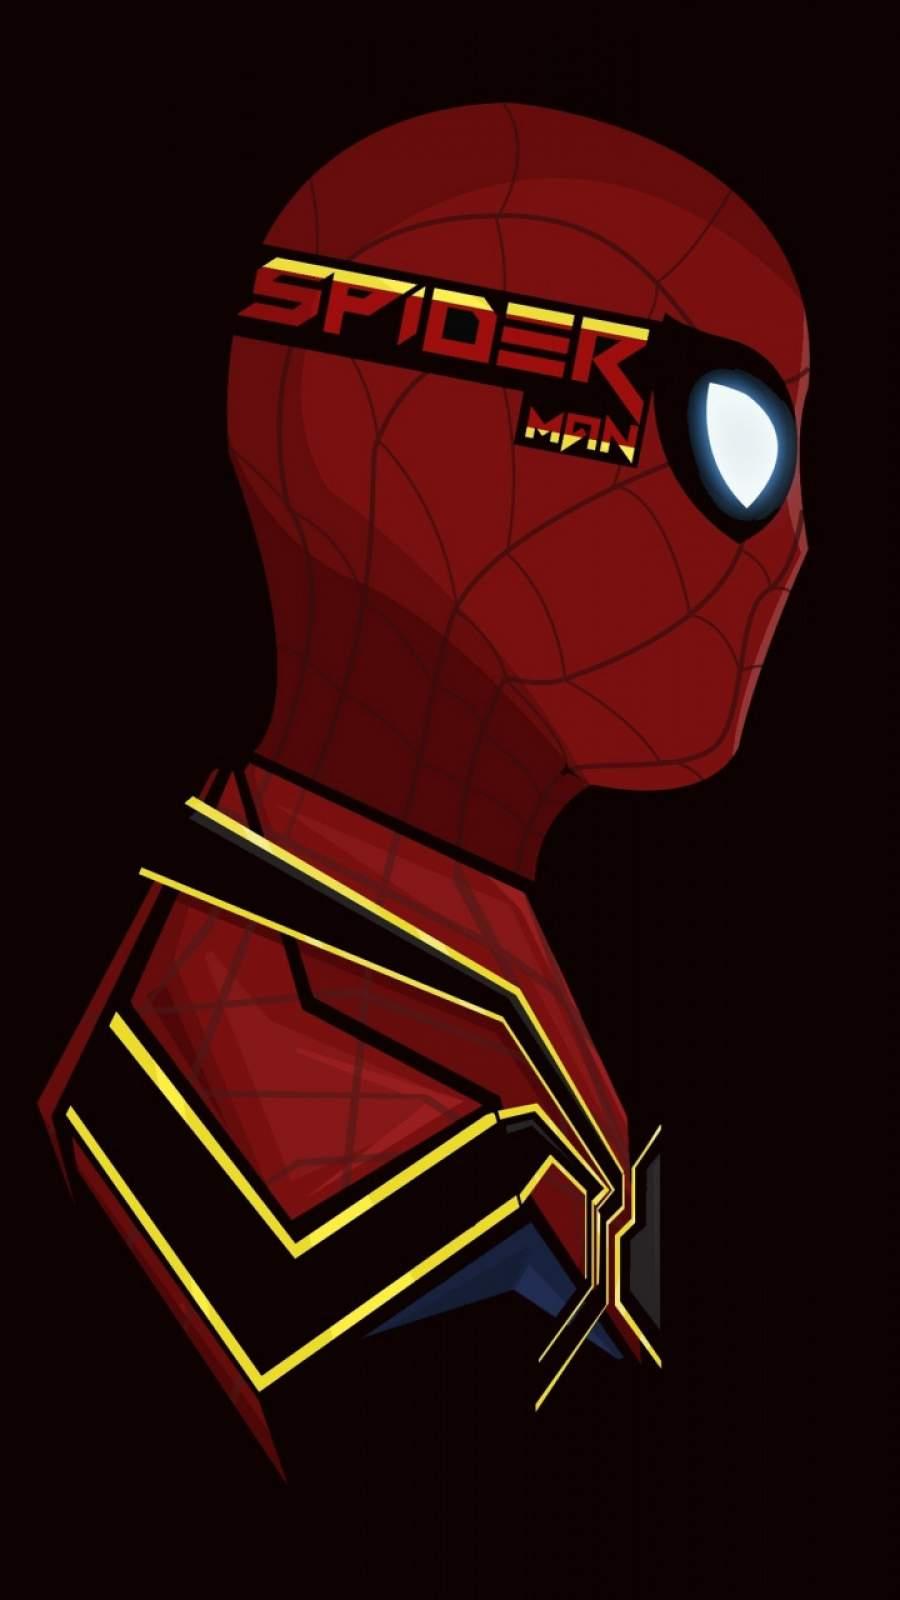 Spiderman Minimal Art iPhone Wallpaper